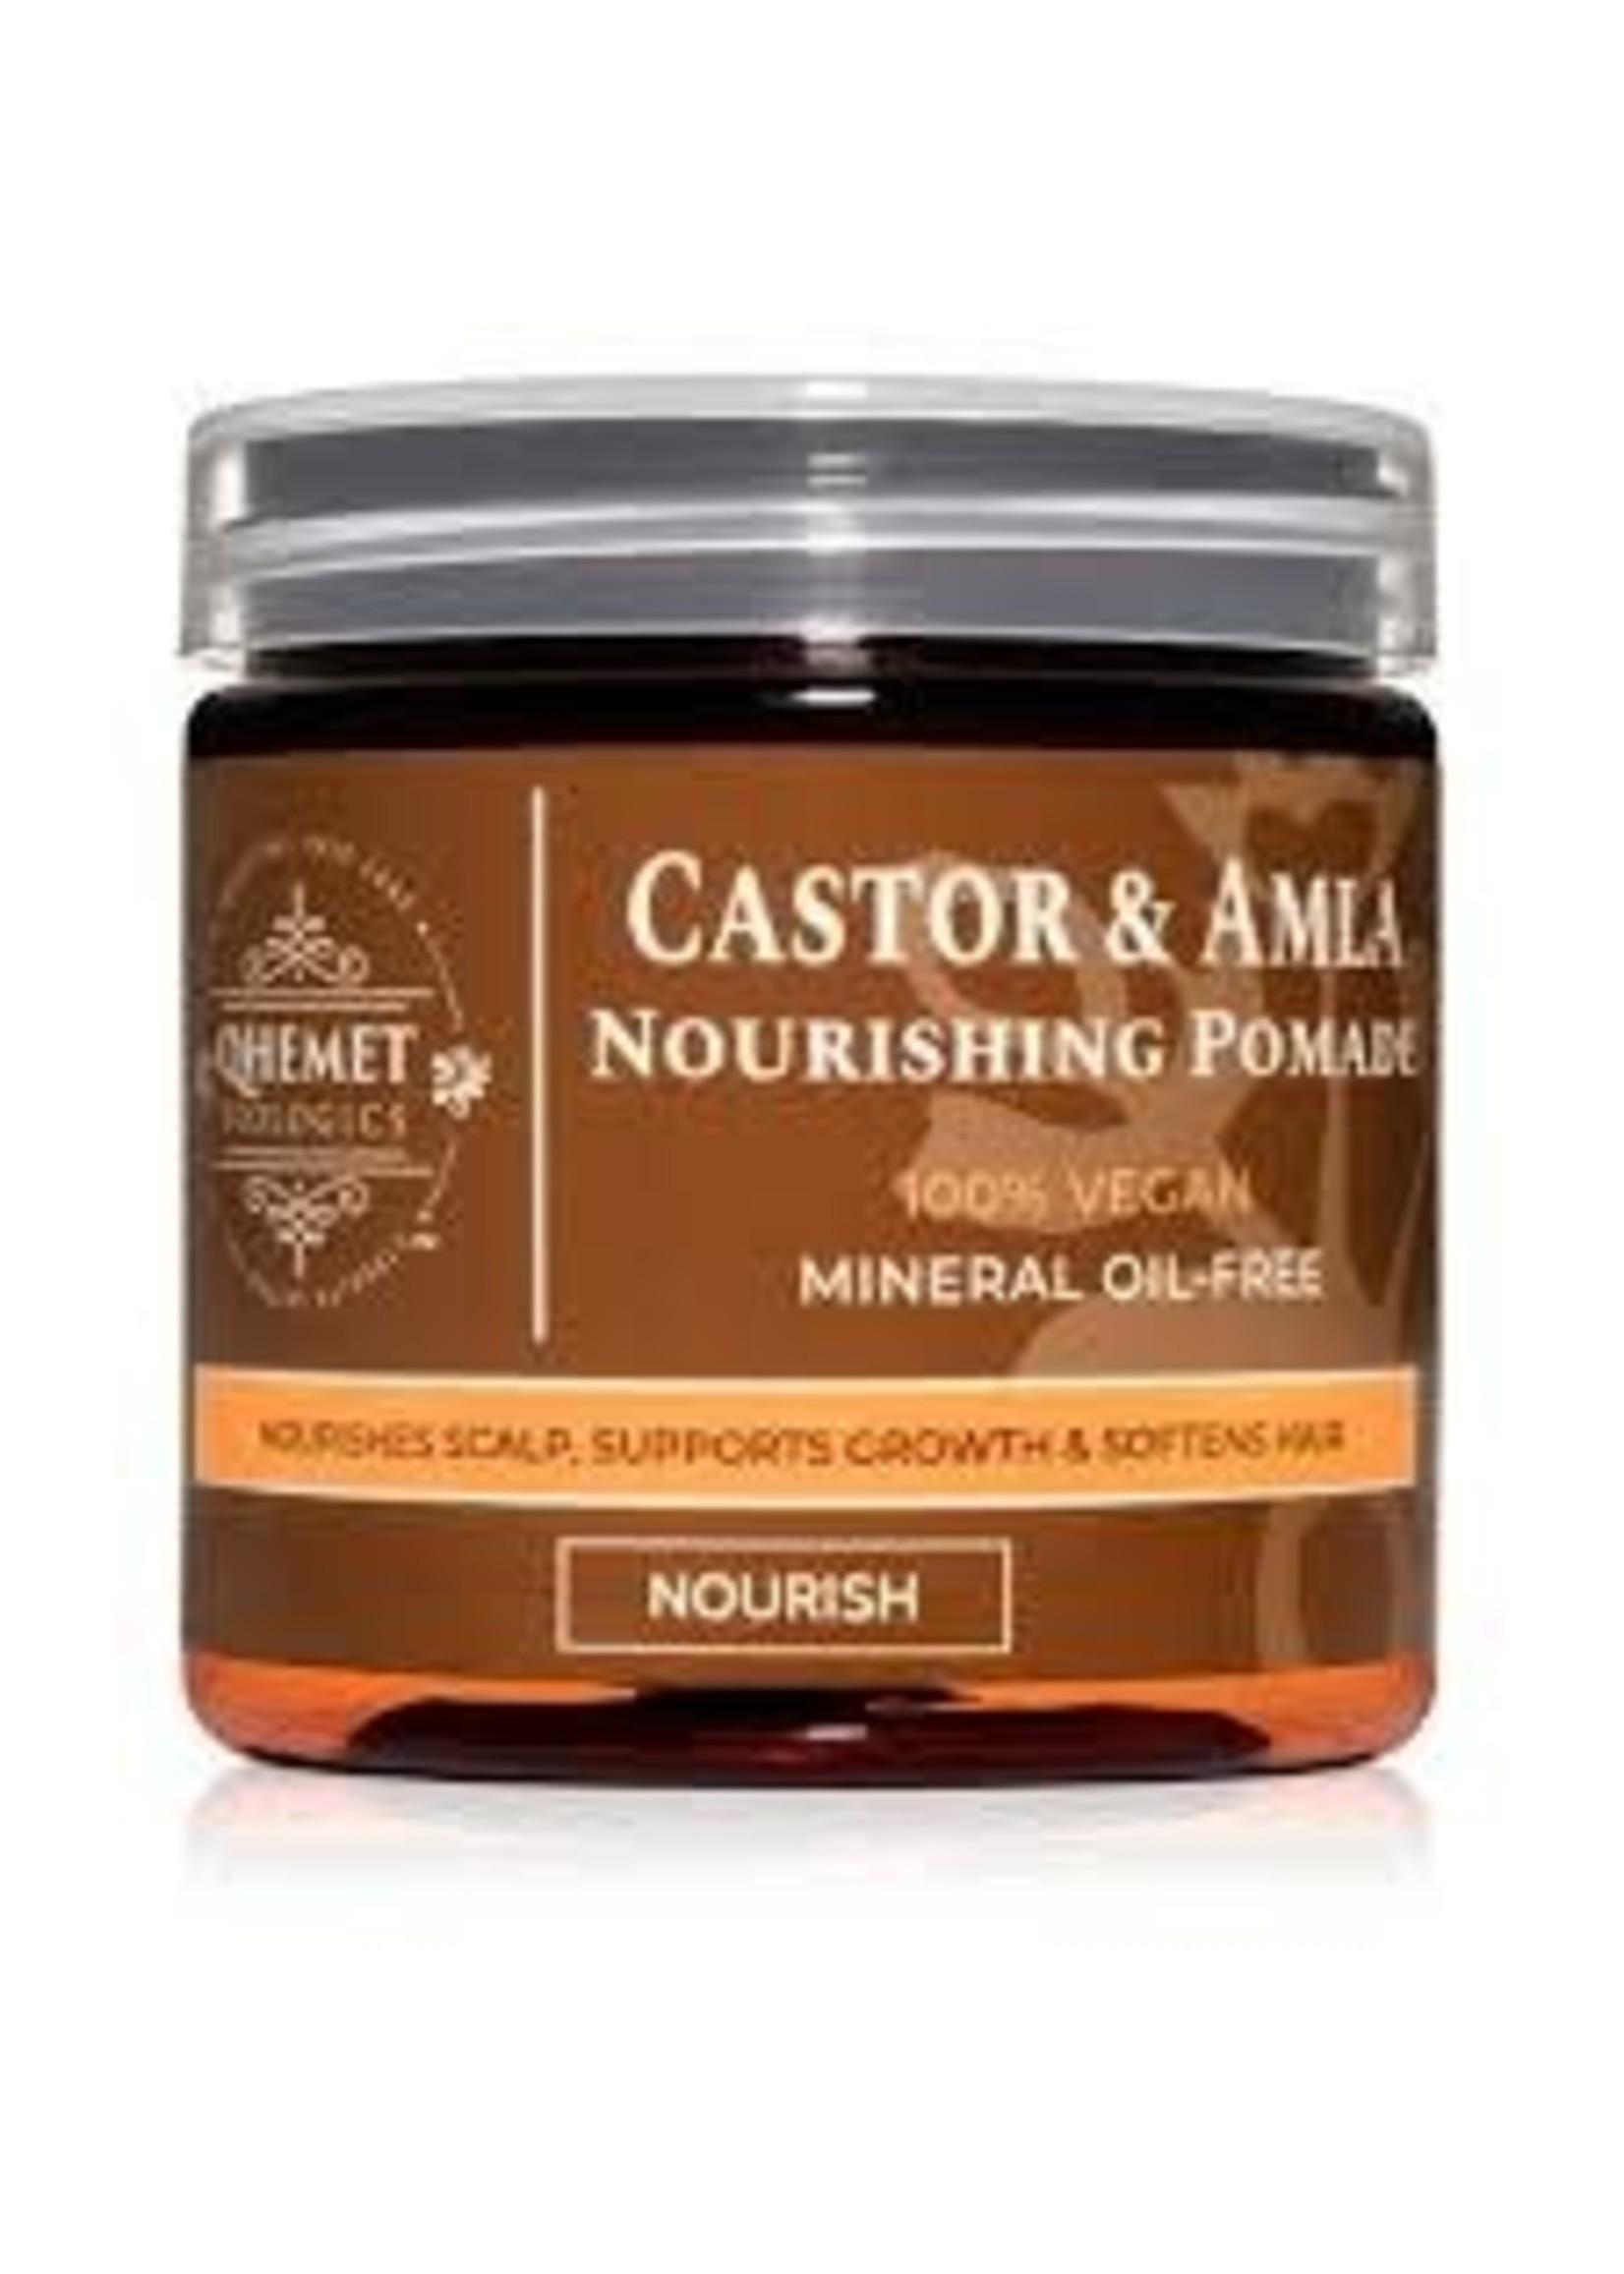 Qhemet Castor & Amla Nourishing Pomade